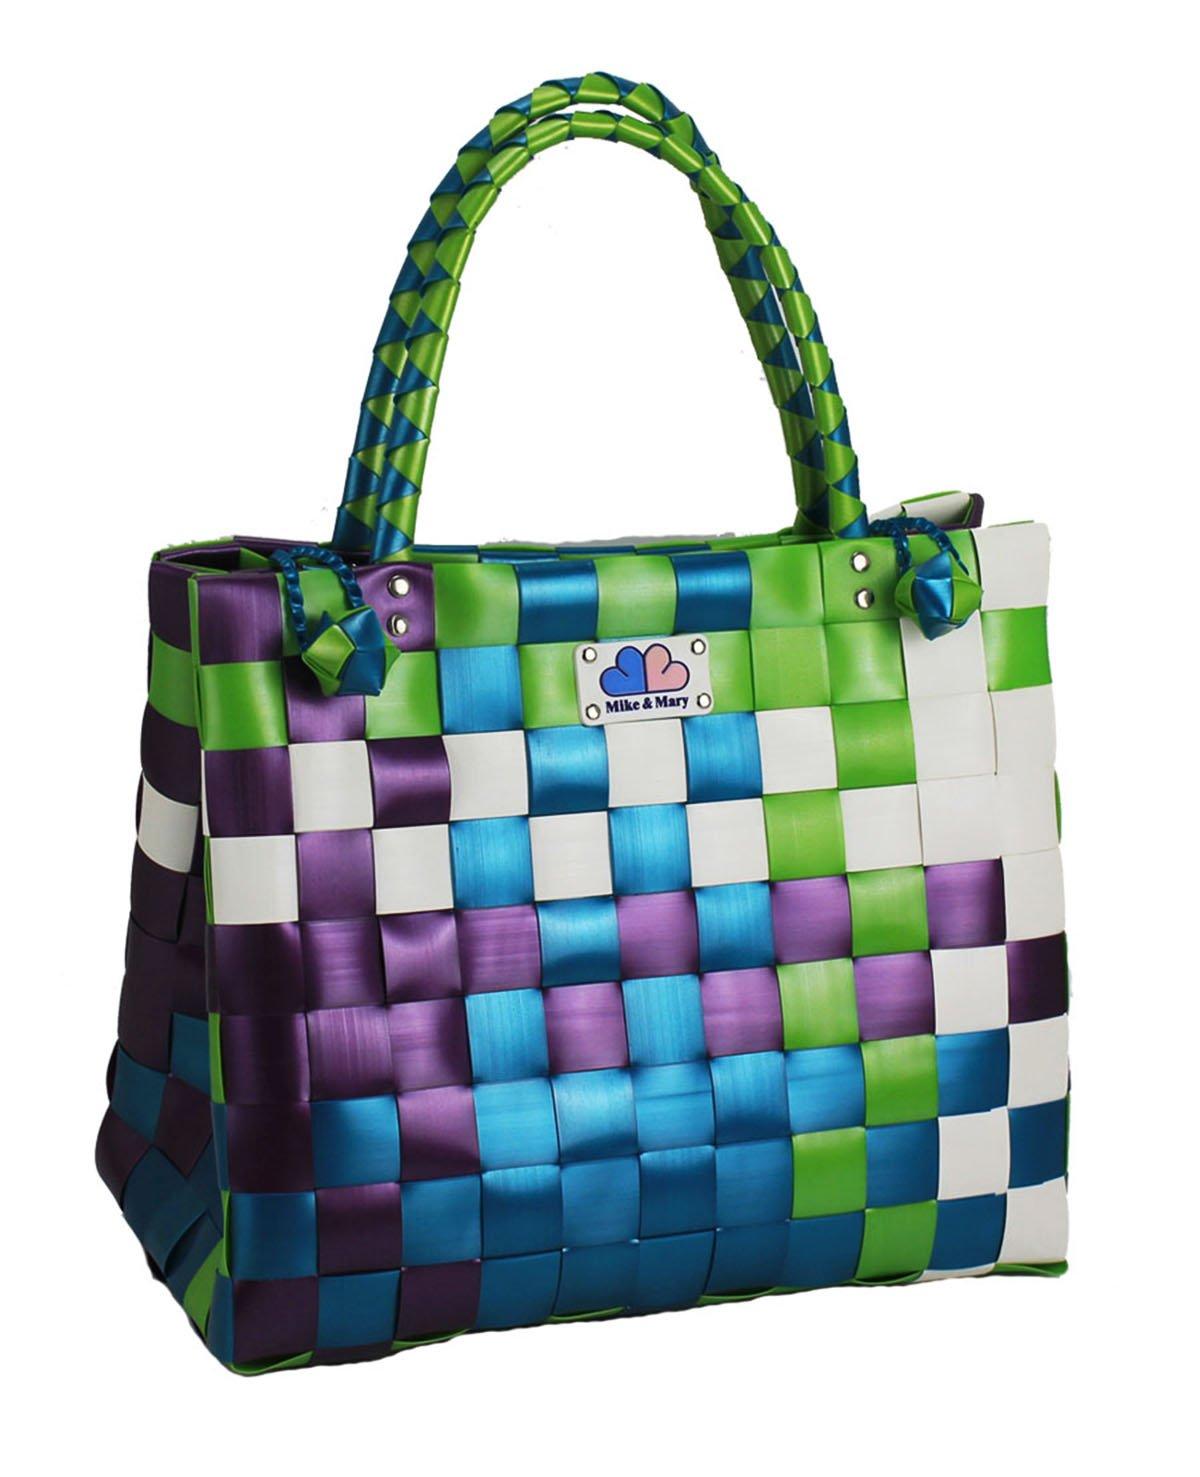 Mike & Mary折りたたみ式ショッピングバッグバスケットBraidedプラスチックハンドバッグファッションWashable Grocery Bag 38Lx21Wx32H グリーン MM-BG-FD-EB150630-MIX3 B013282JE6 グリーン グリーン